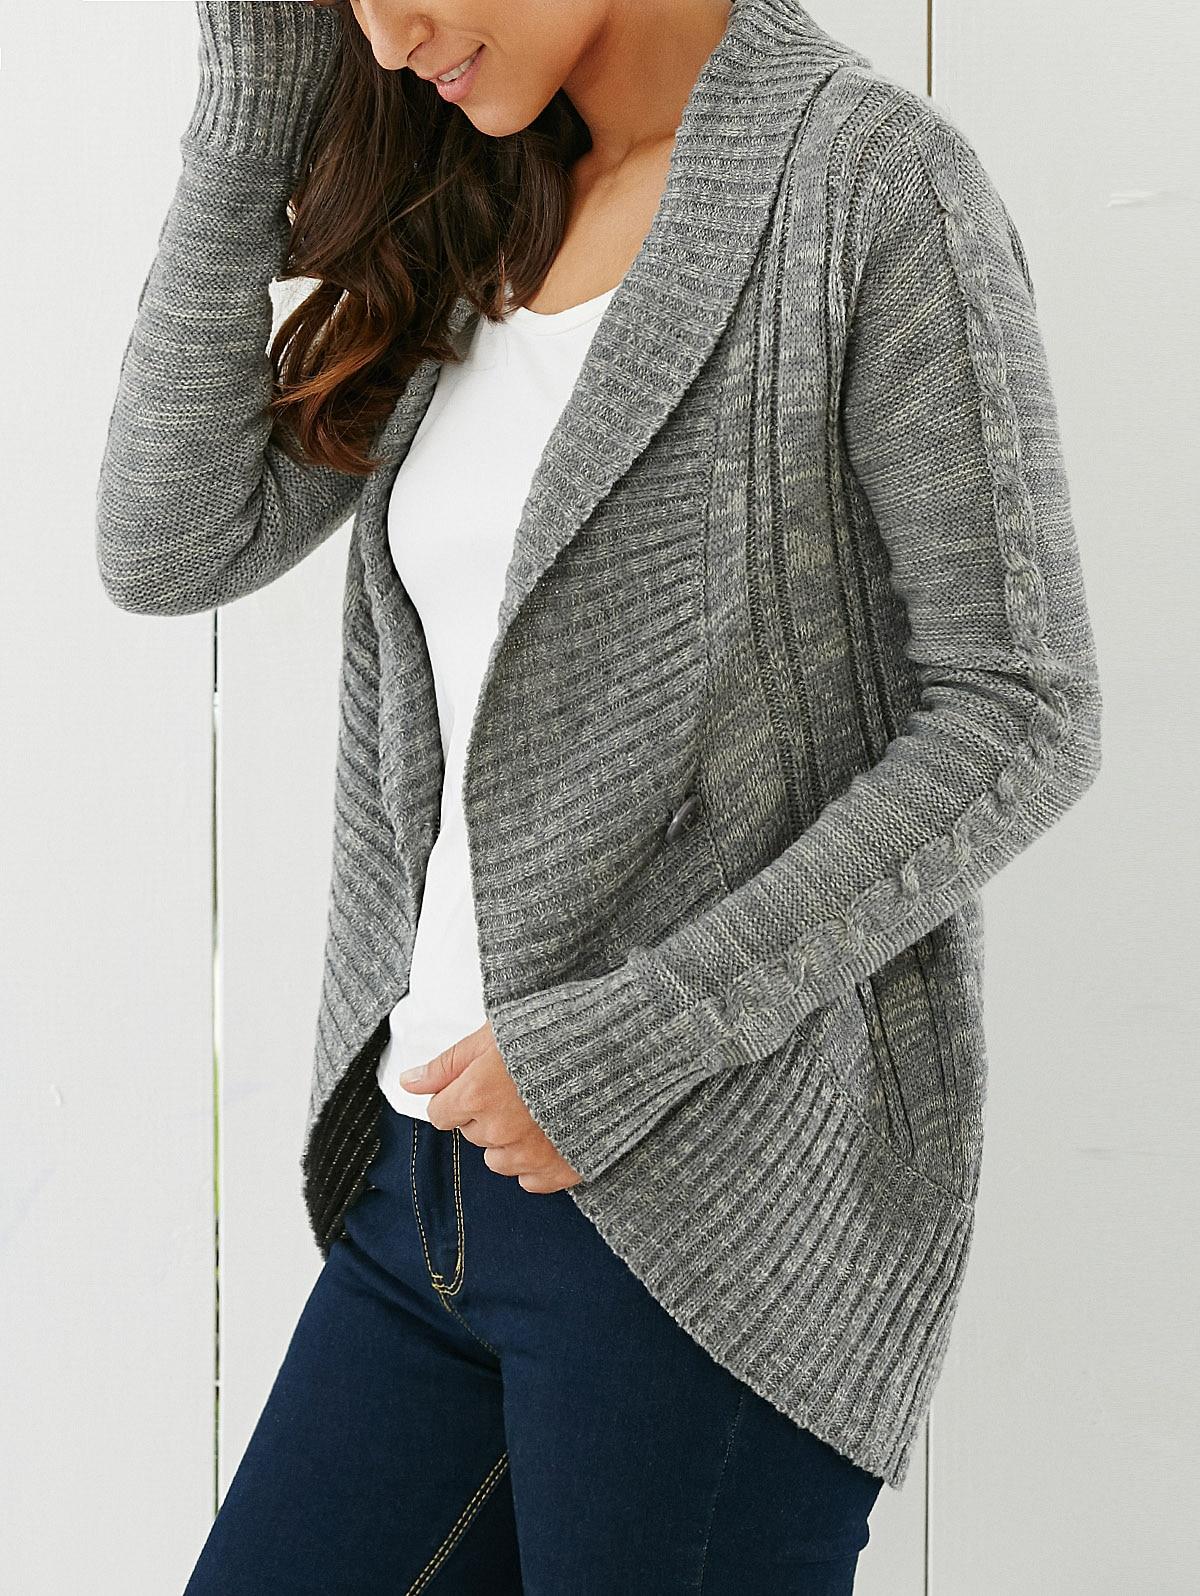 494e982f9ca ZAN.STYLE Winter Shawl Collar Cardigan women V neck Button up rib knit  Irregular Slim sweater Cardigan gray pull femme hiver